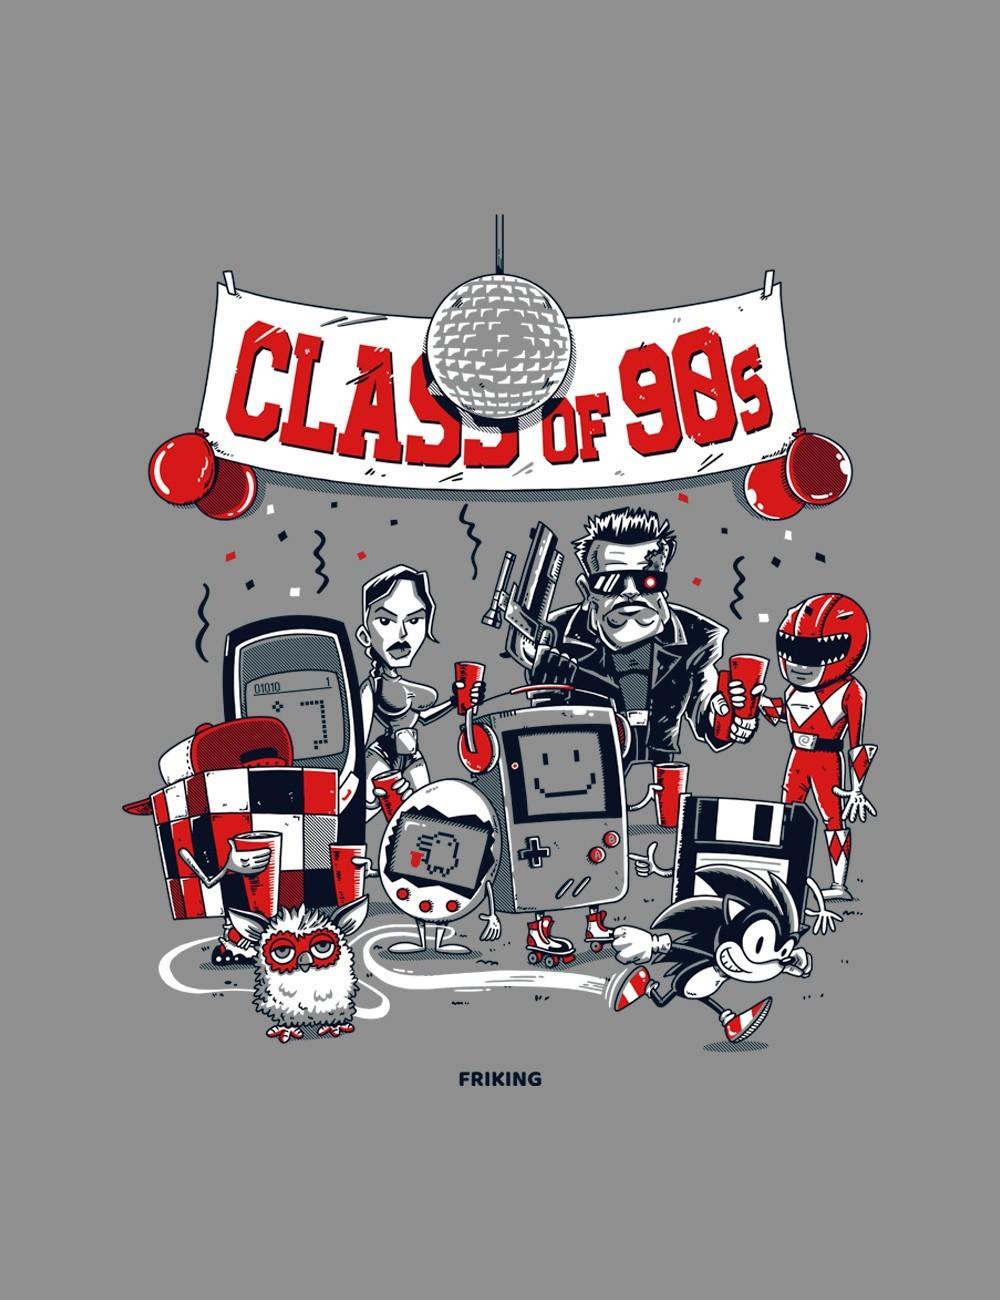 Class of 90s